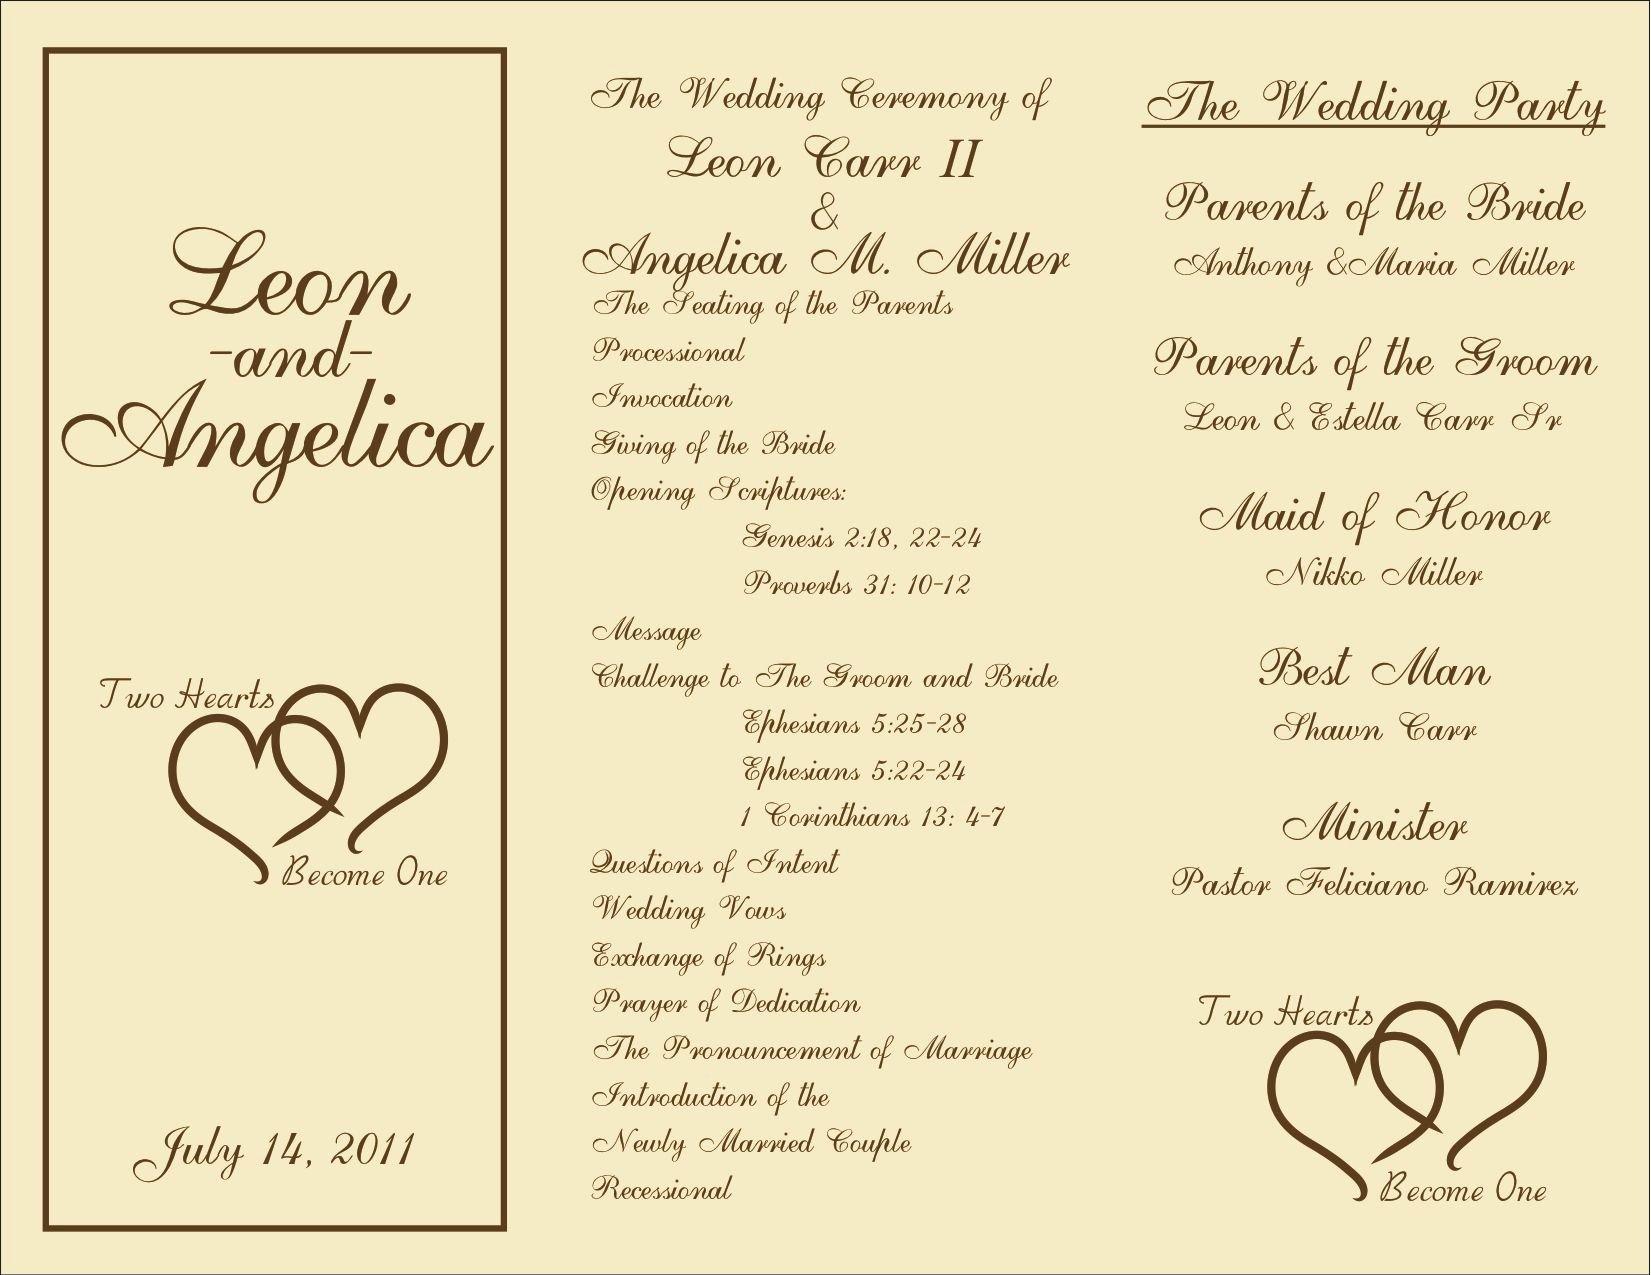 Free Wedding Programs Templates Beautiful Printable Wedding Programs On Pinterest